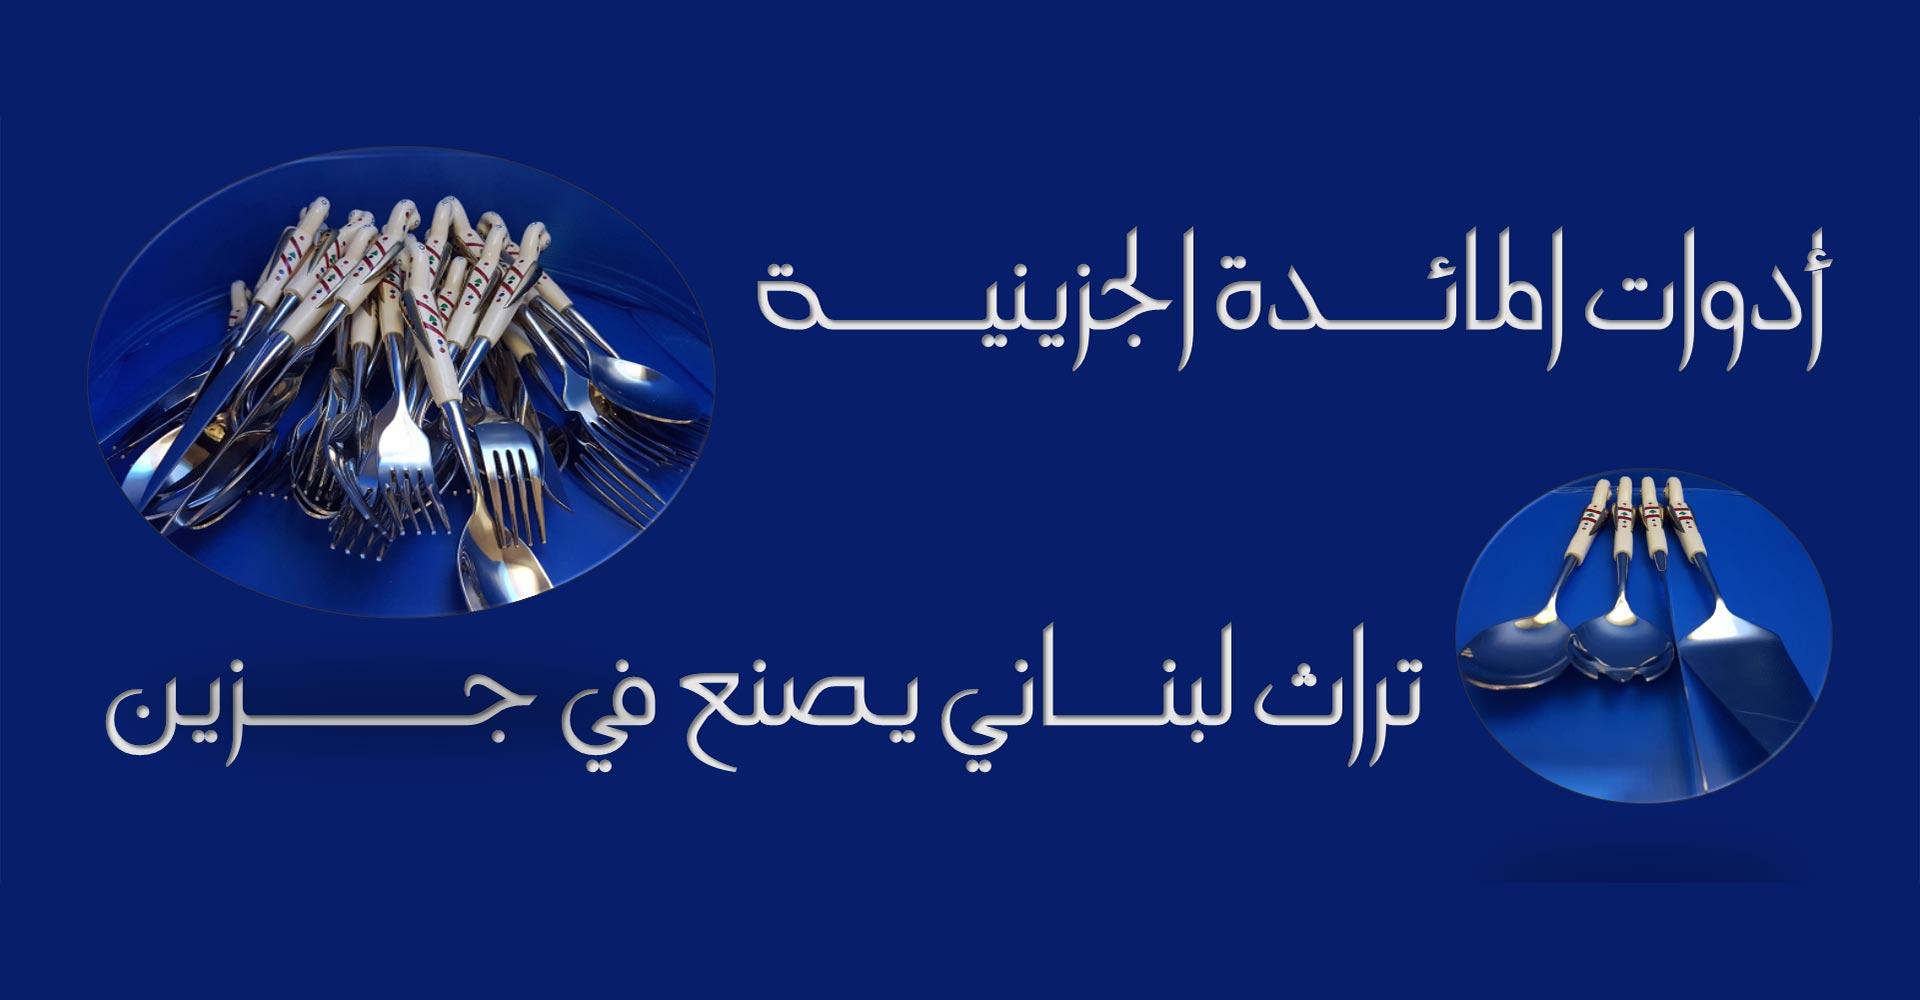 jezzine-cutlery